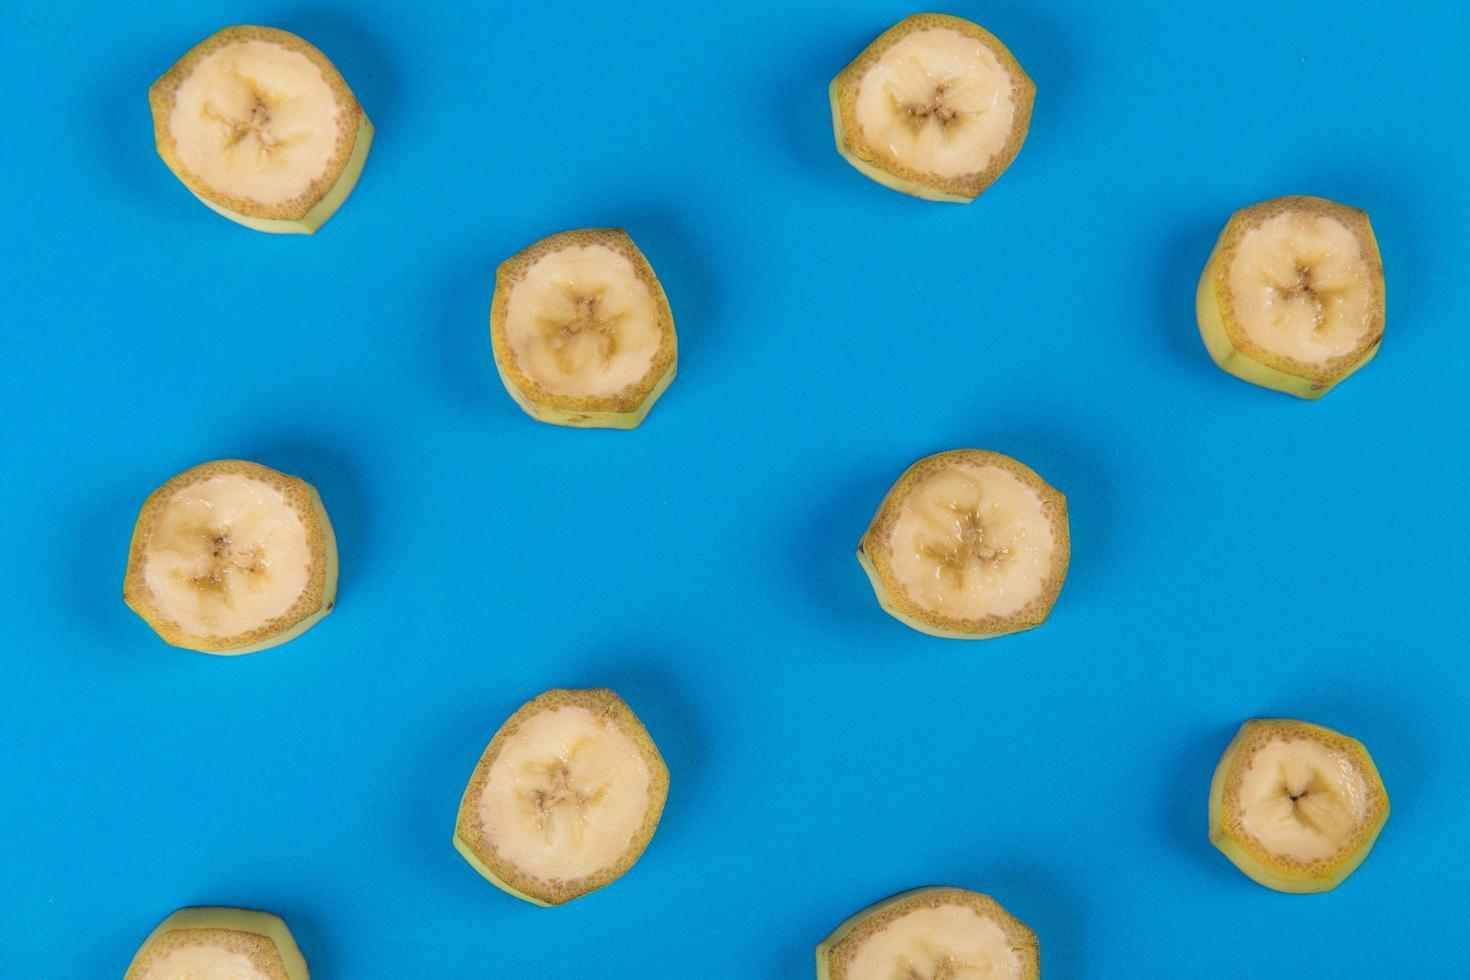 Tranches de banane non pelées sur fond bleu photo